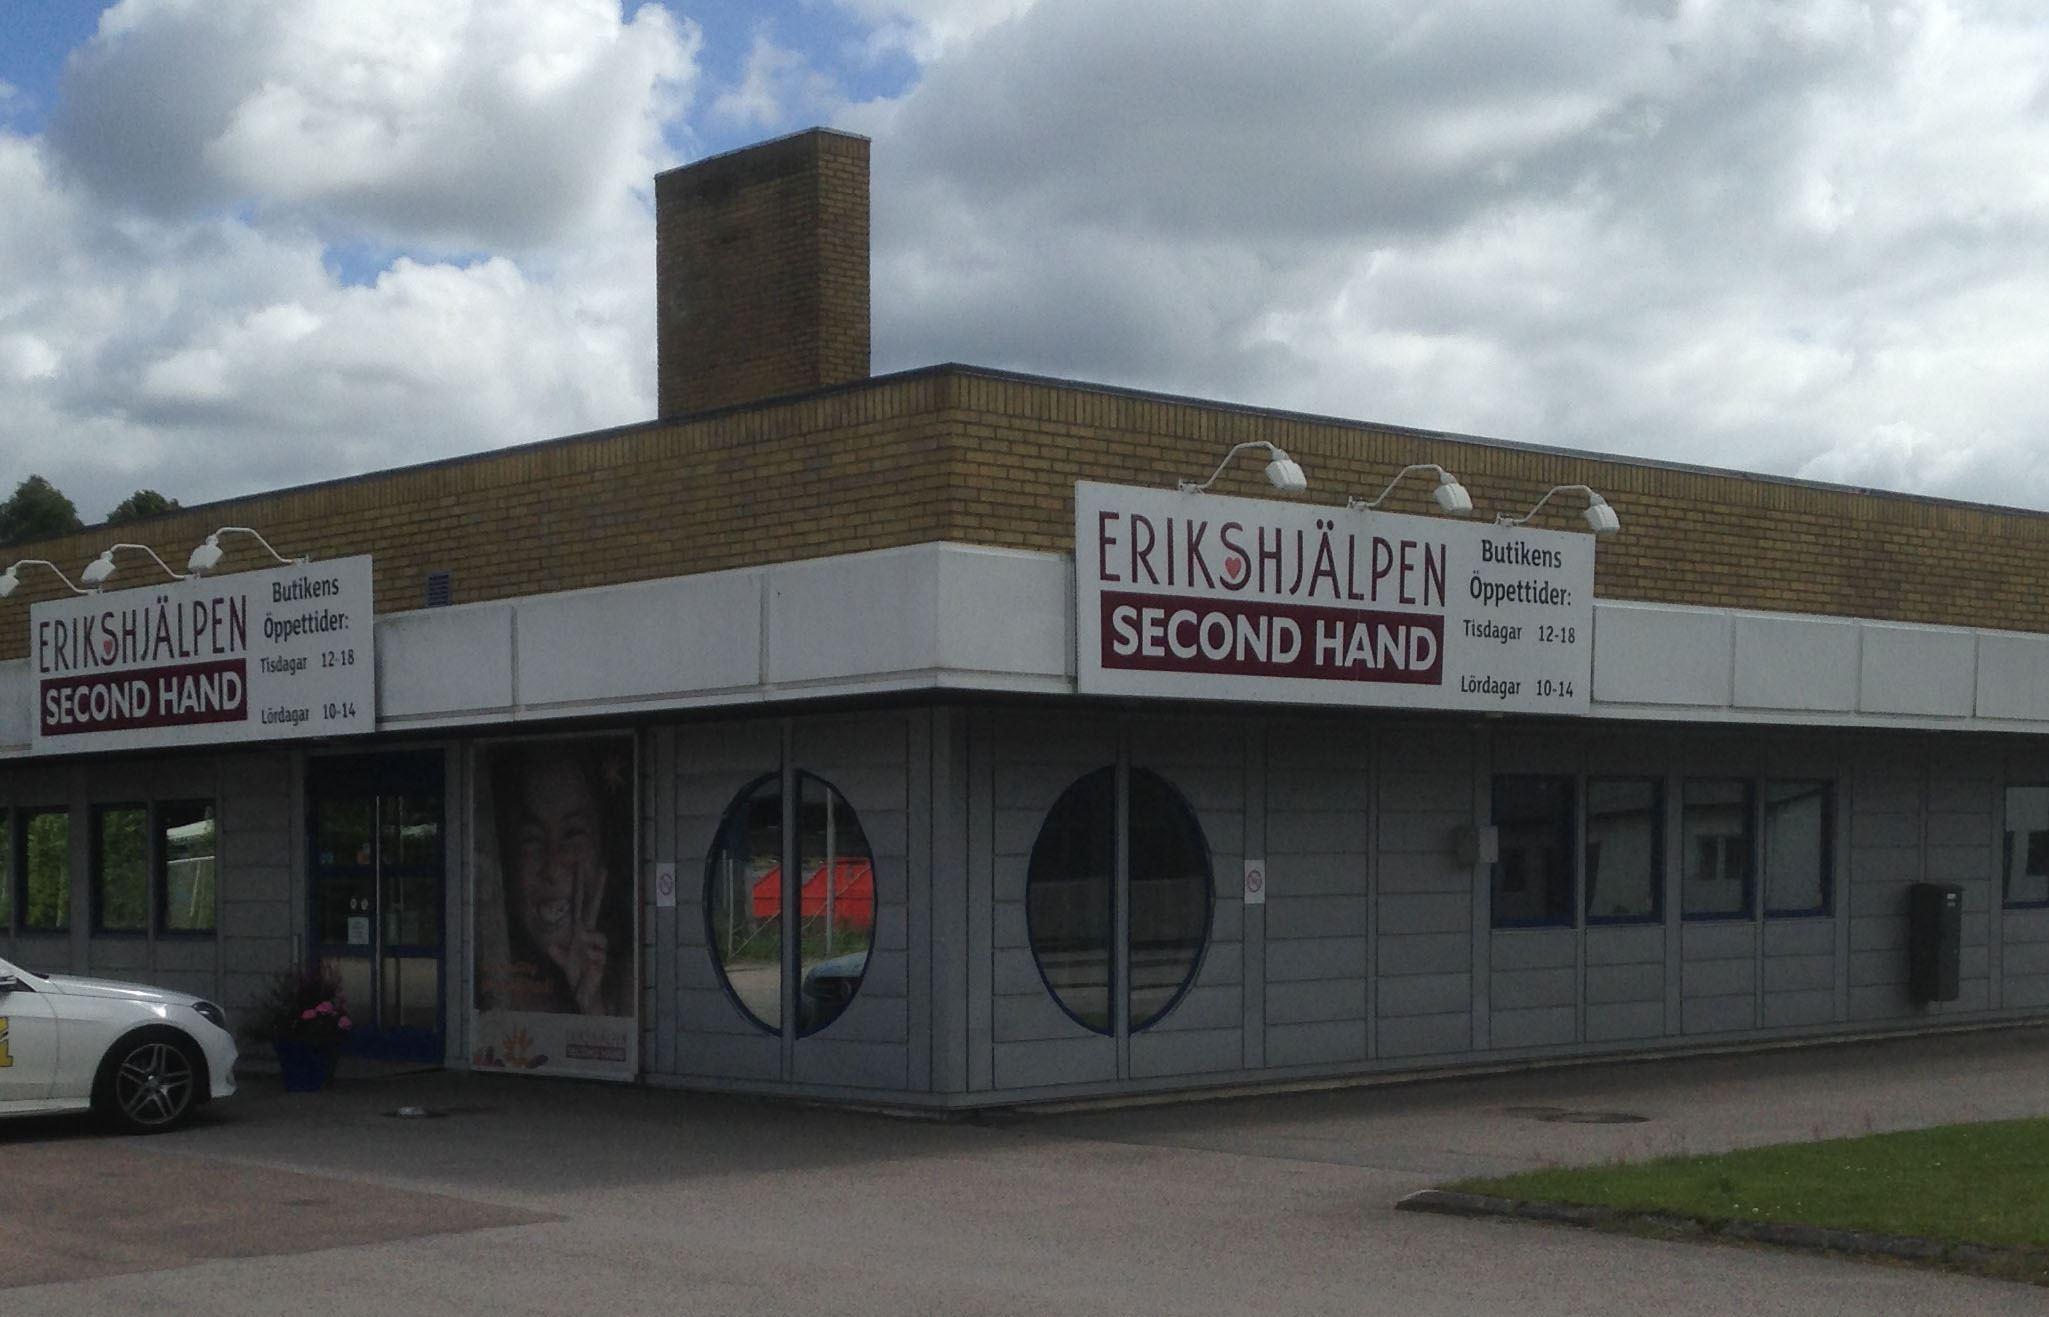 Erikshjälpen Second-Hand Shop